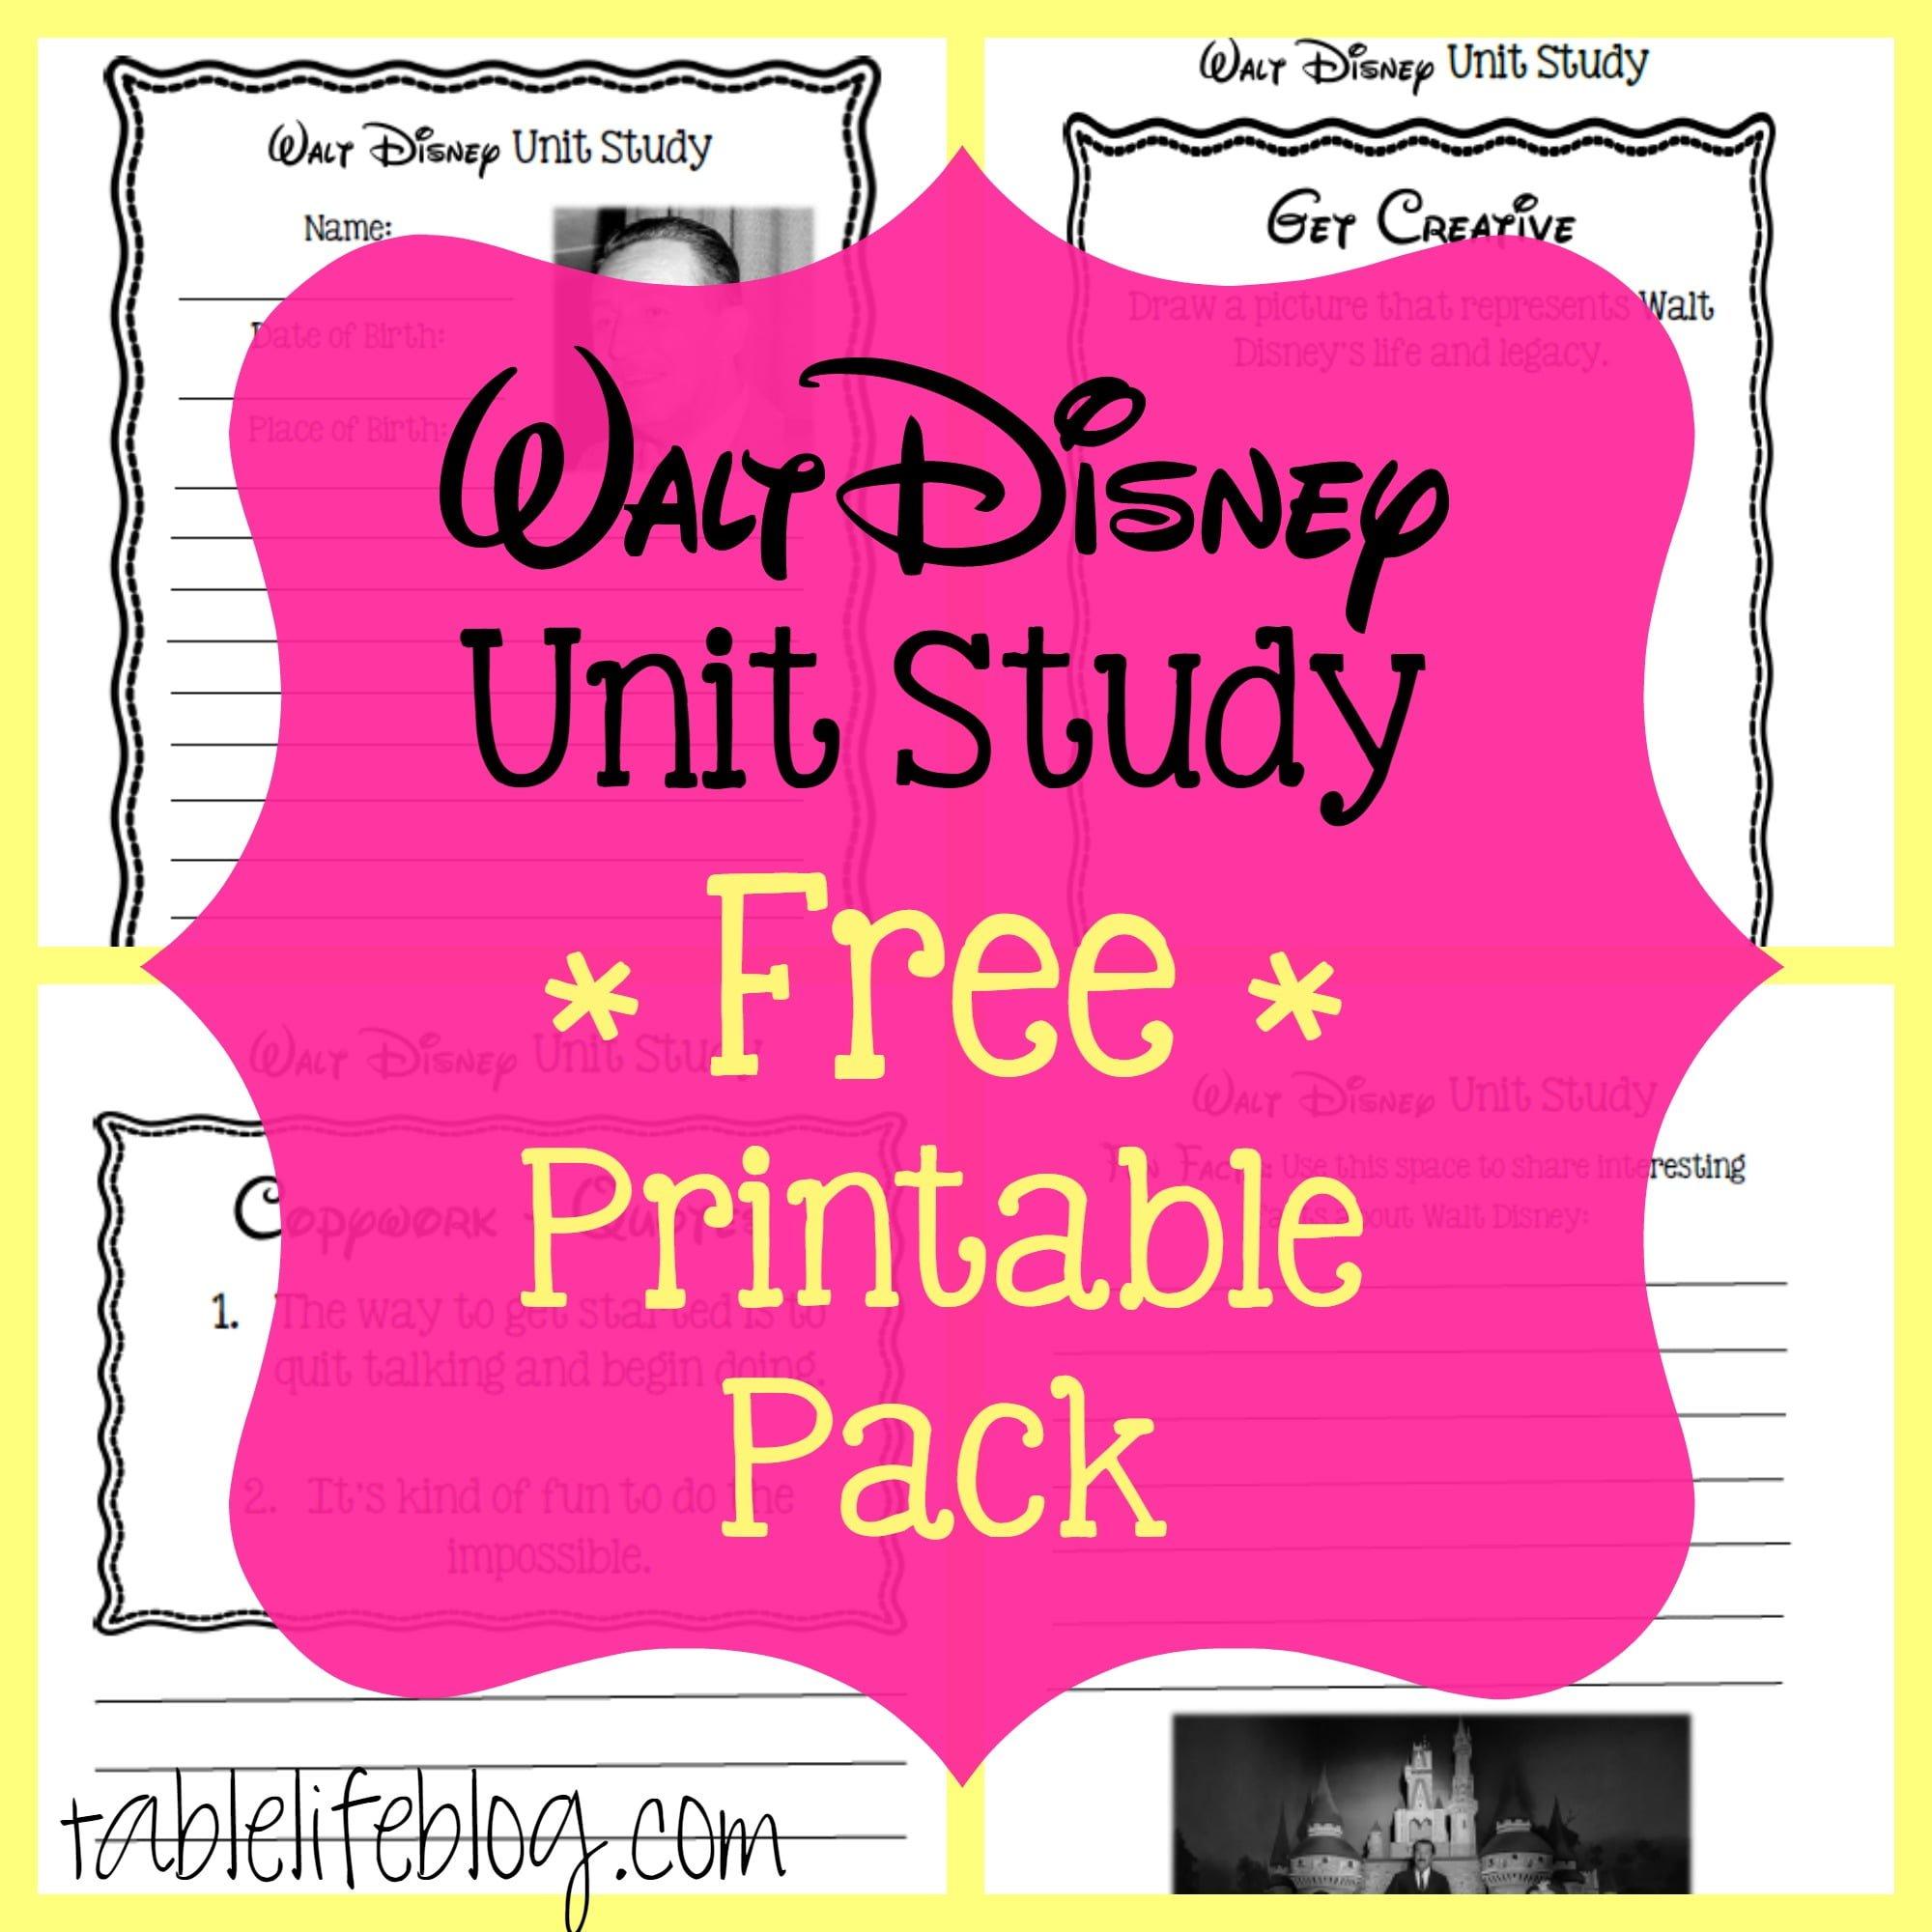 Walt Disney Unit Study With Free Printable Tablelifeblog